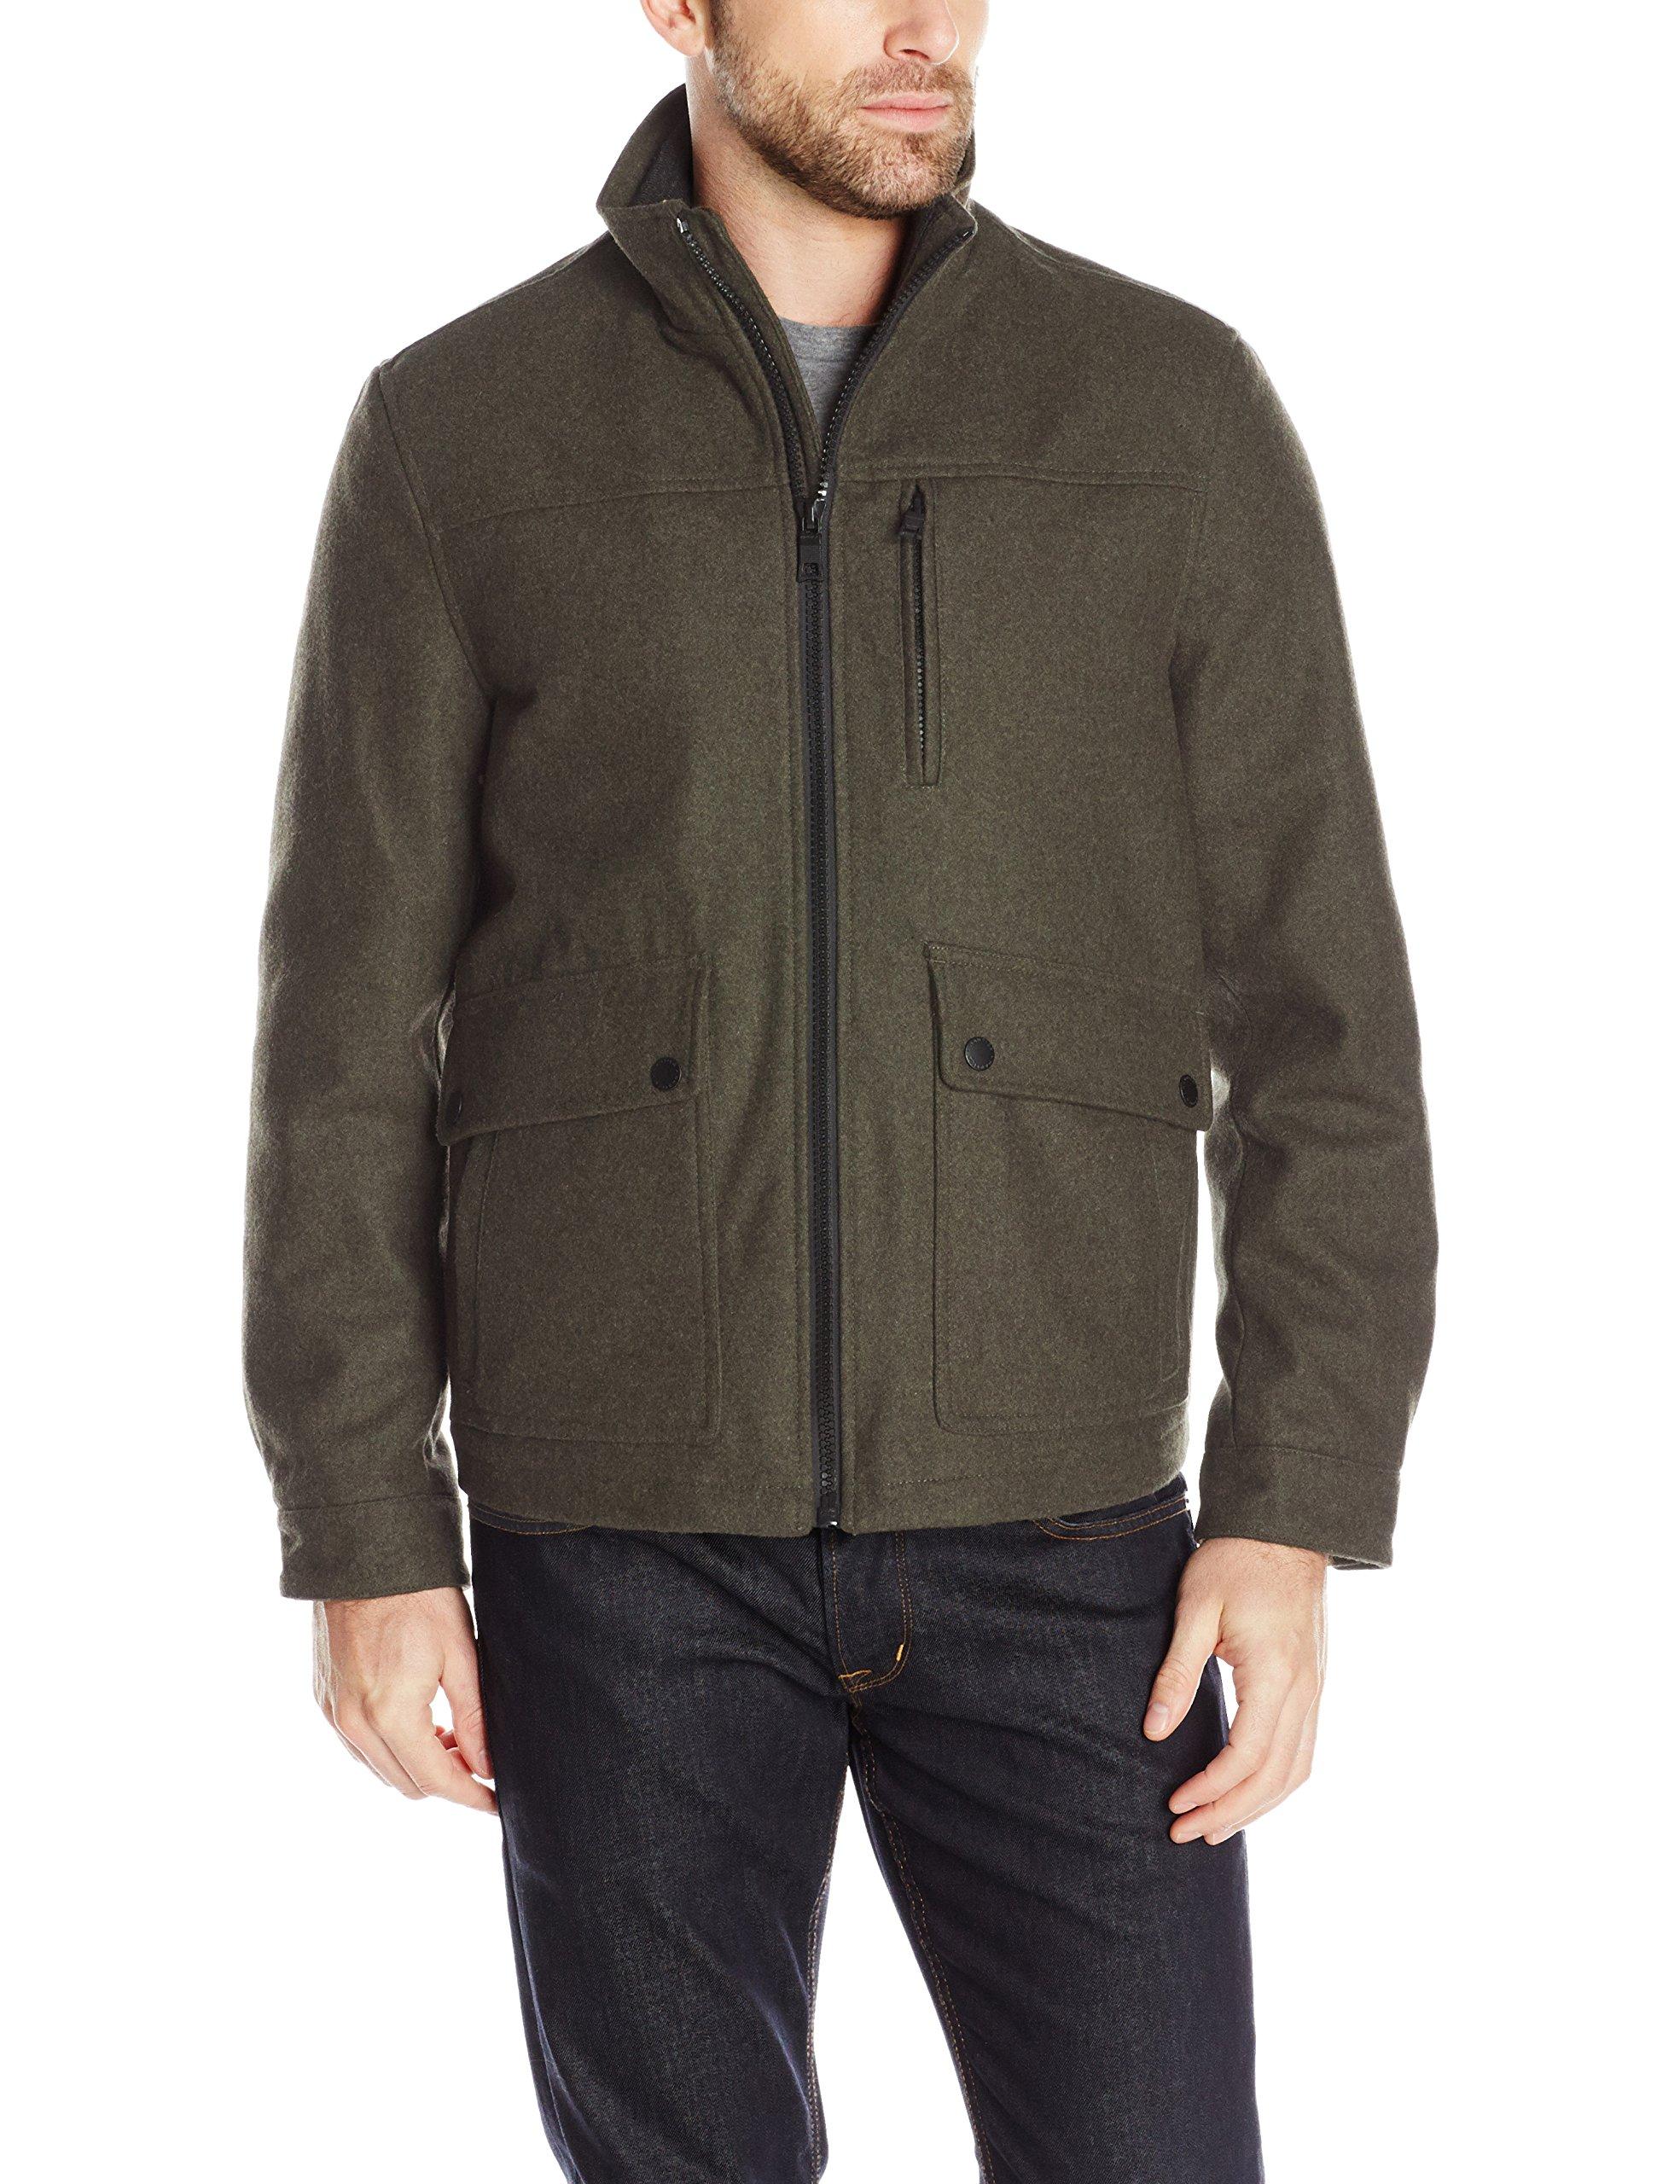 Nautica Men's Wool Melton Jacket, Loden, M by Nautica